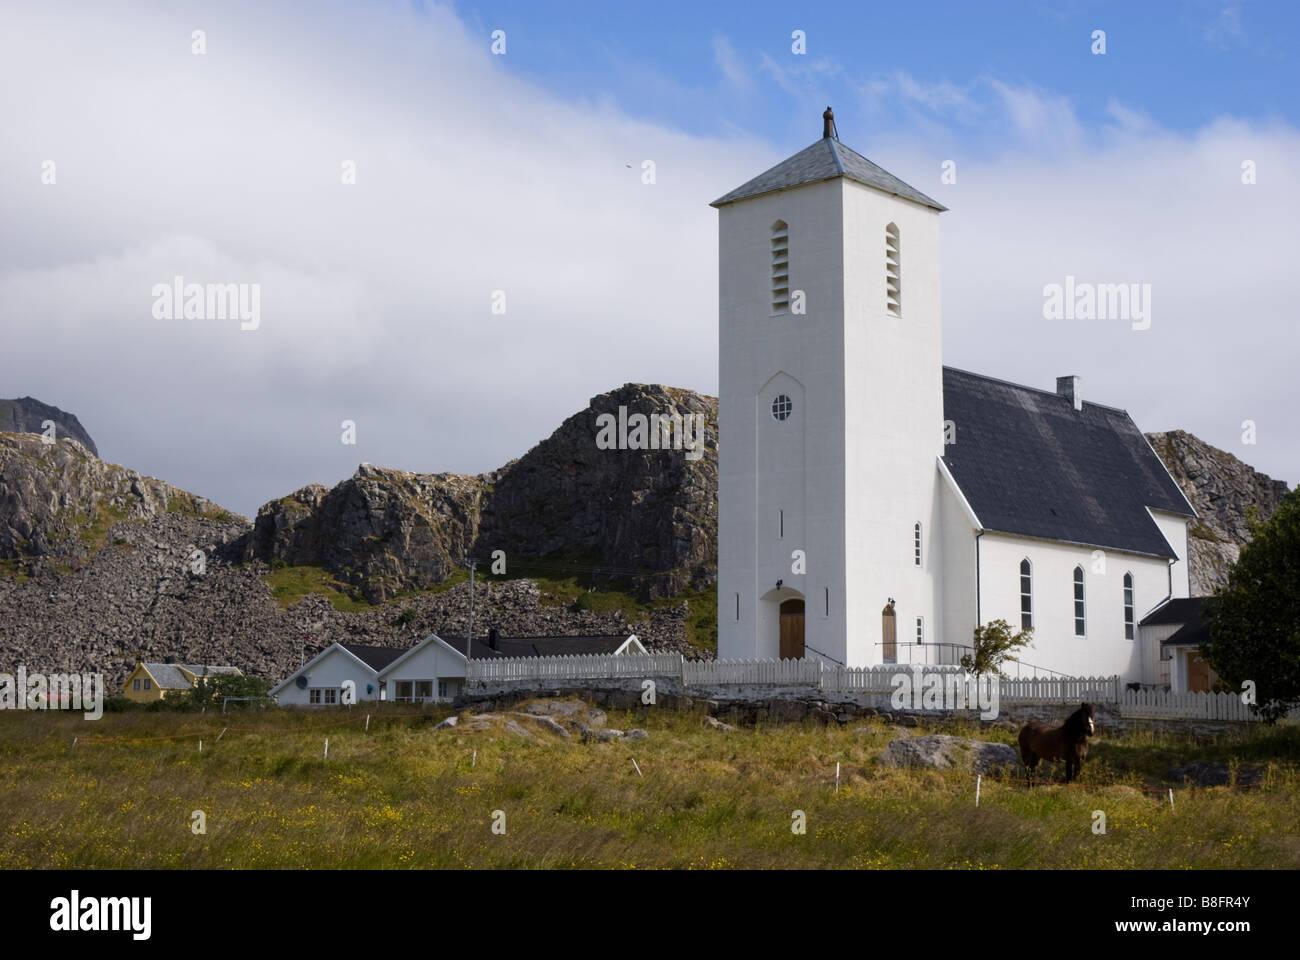 The new church in Sørland, Værøy, Lofoten, Nordland, Norway, Scandinavia - Stock Image